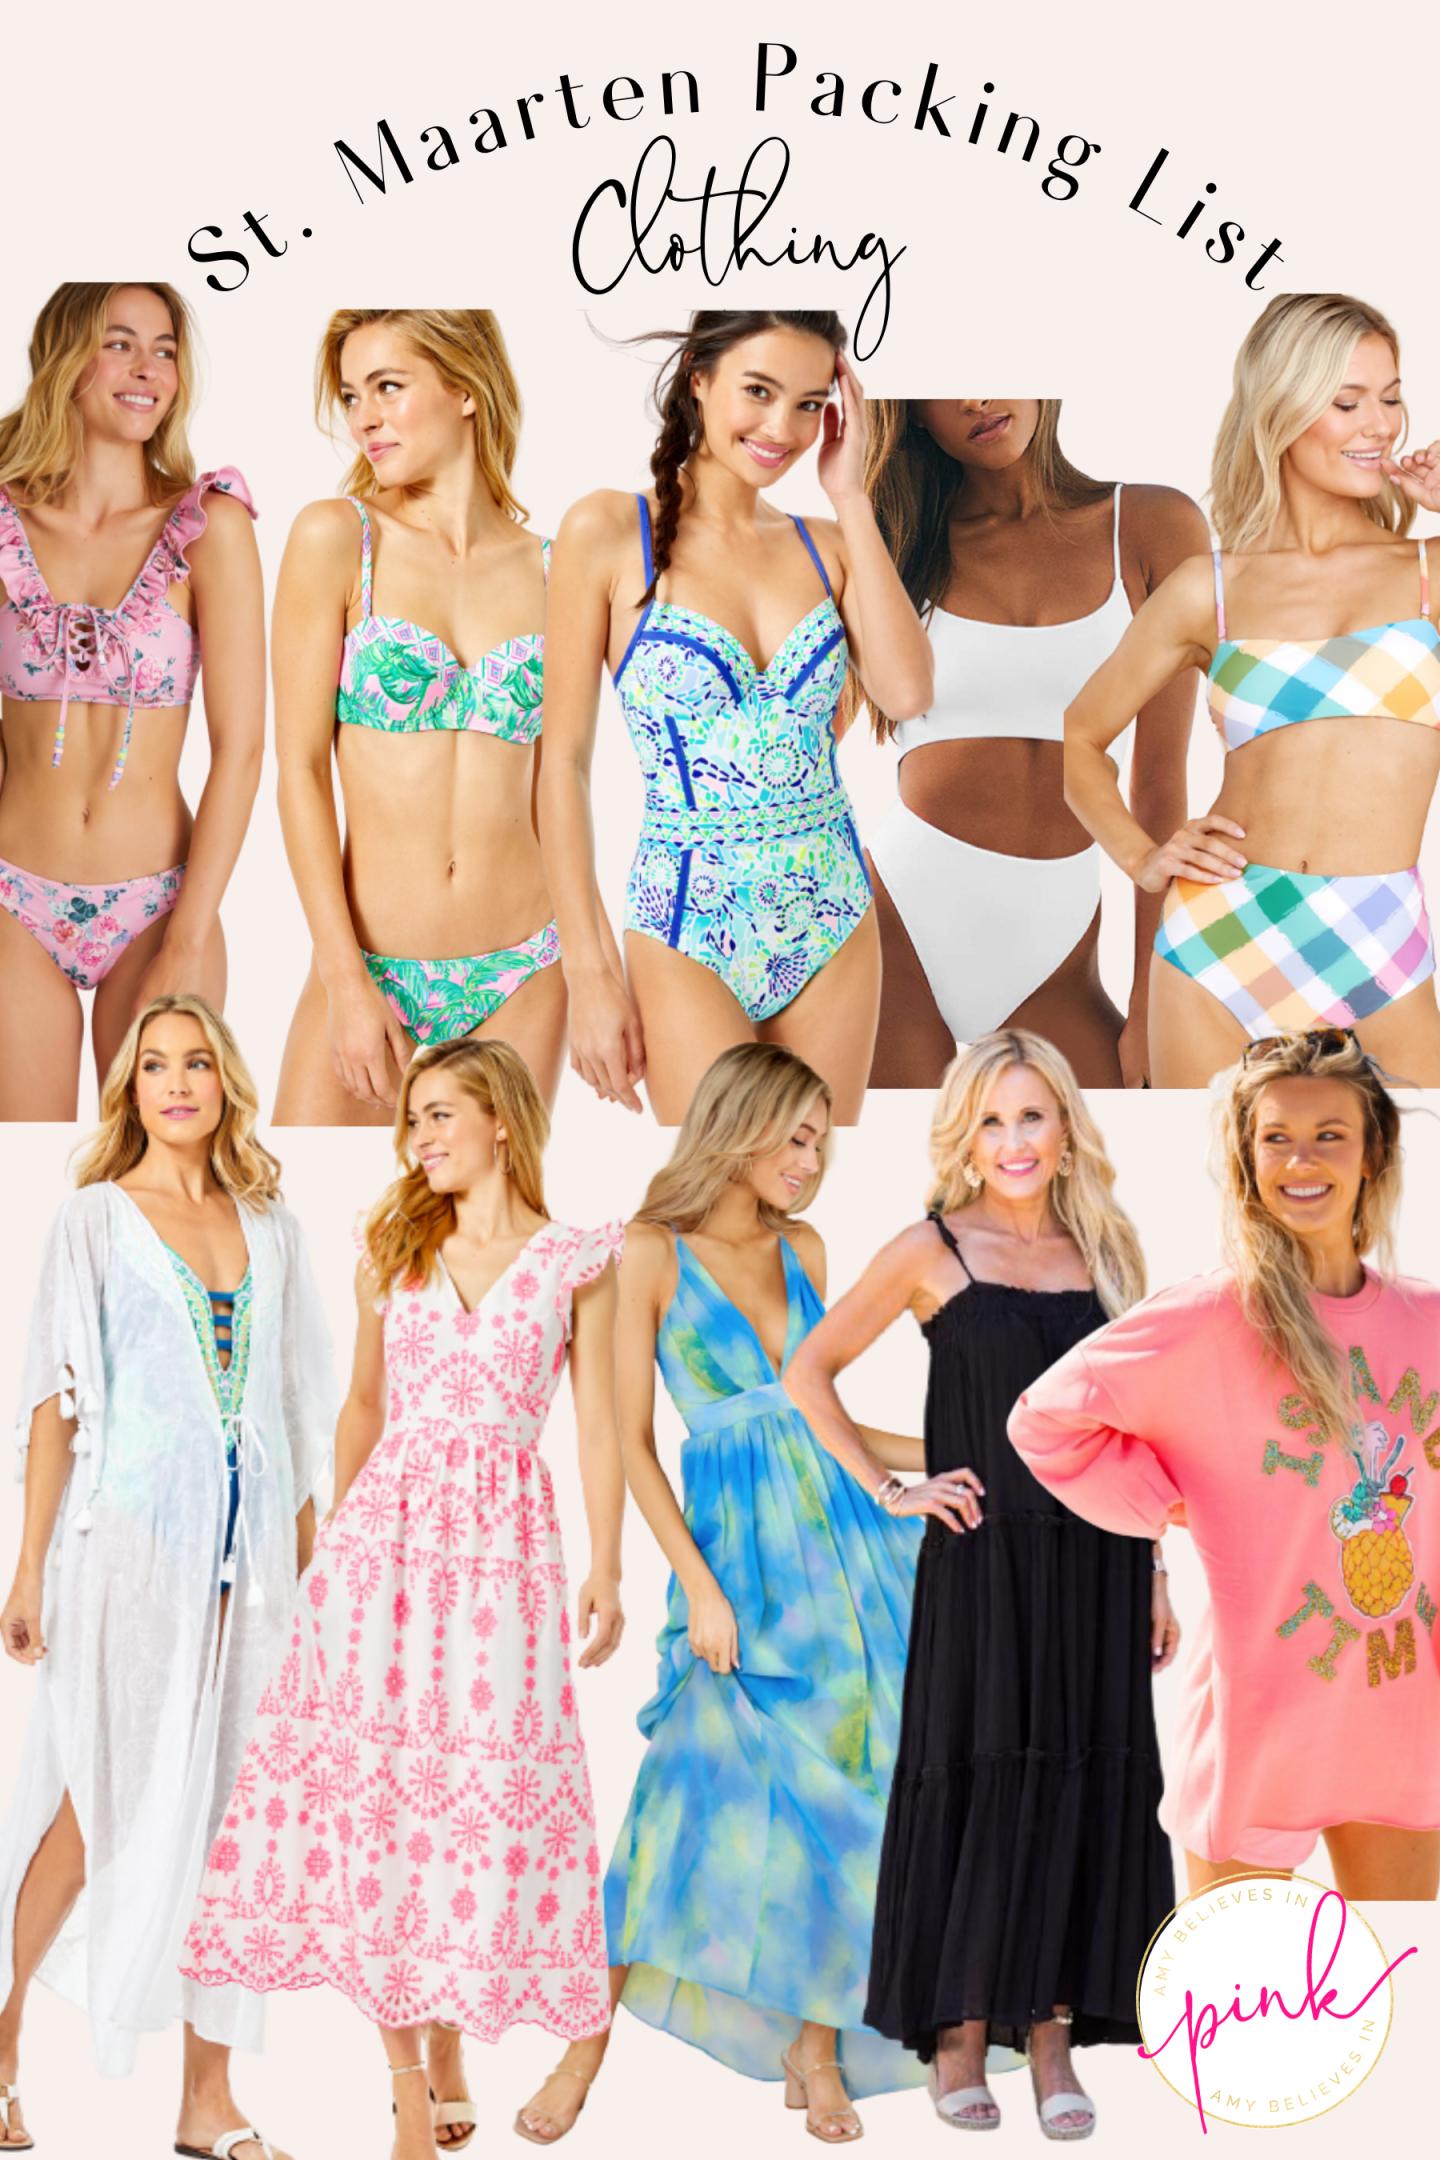 St. Maarten Spring Break Packing List Clothing